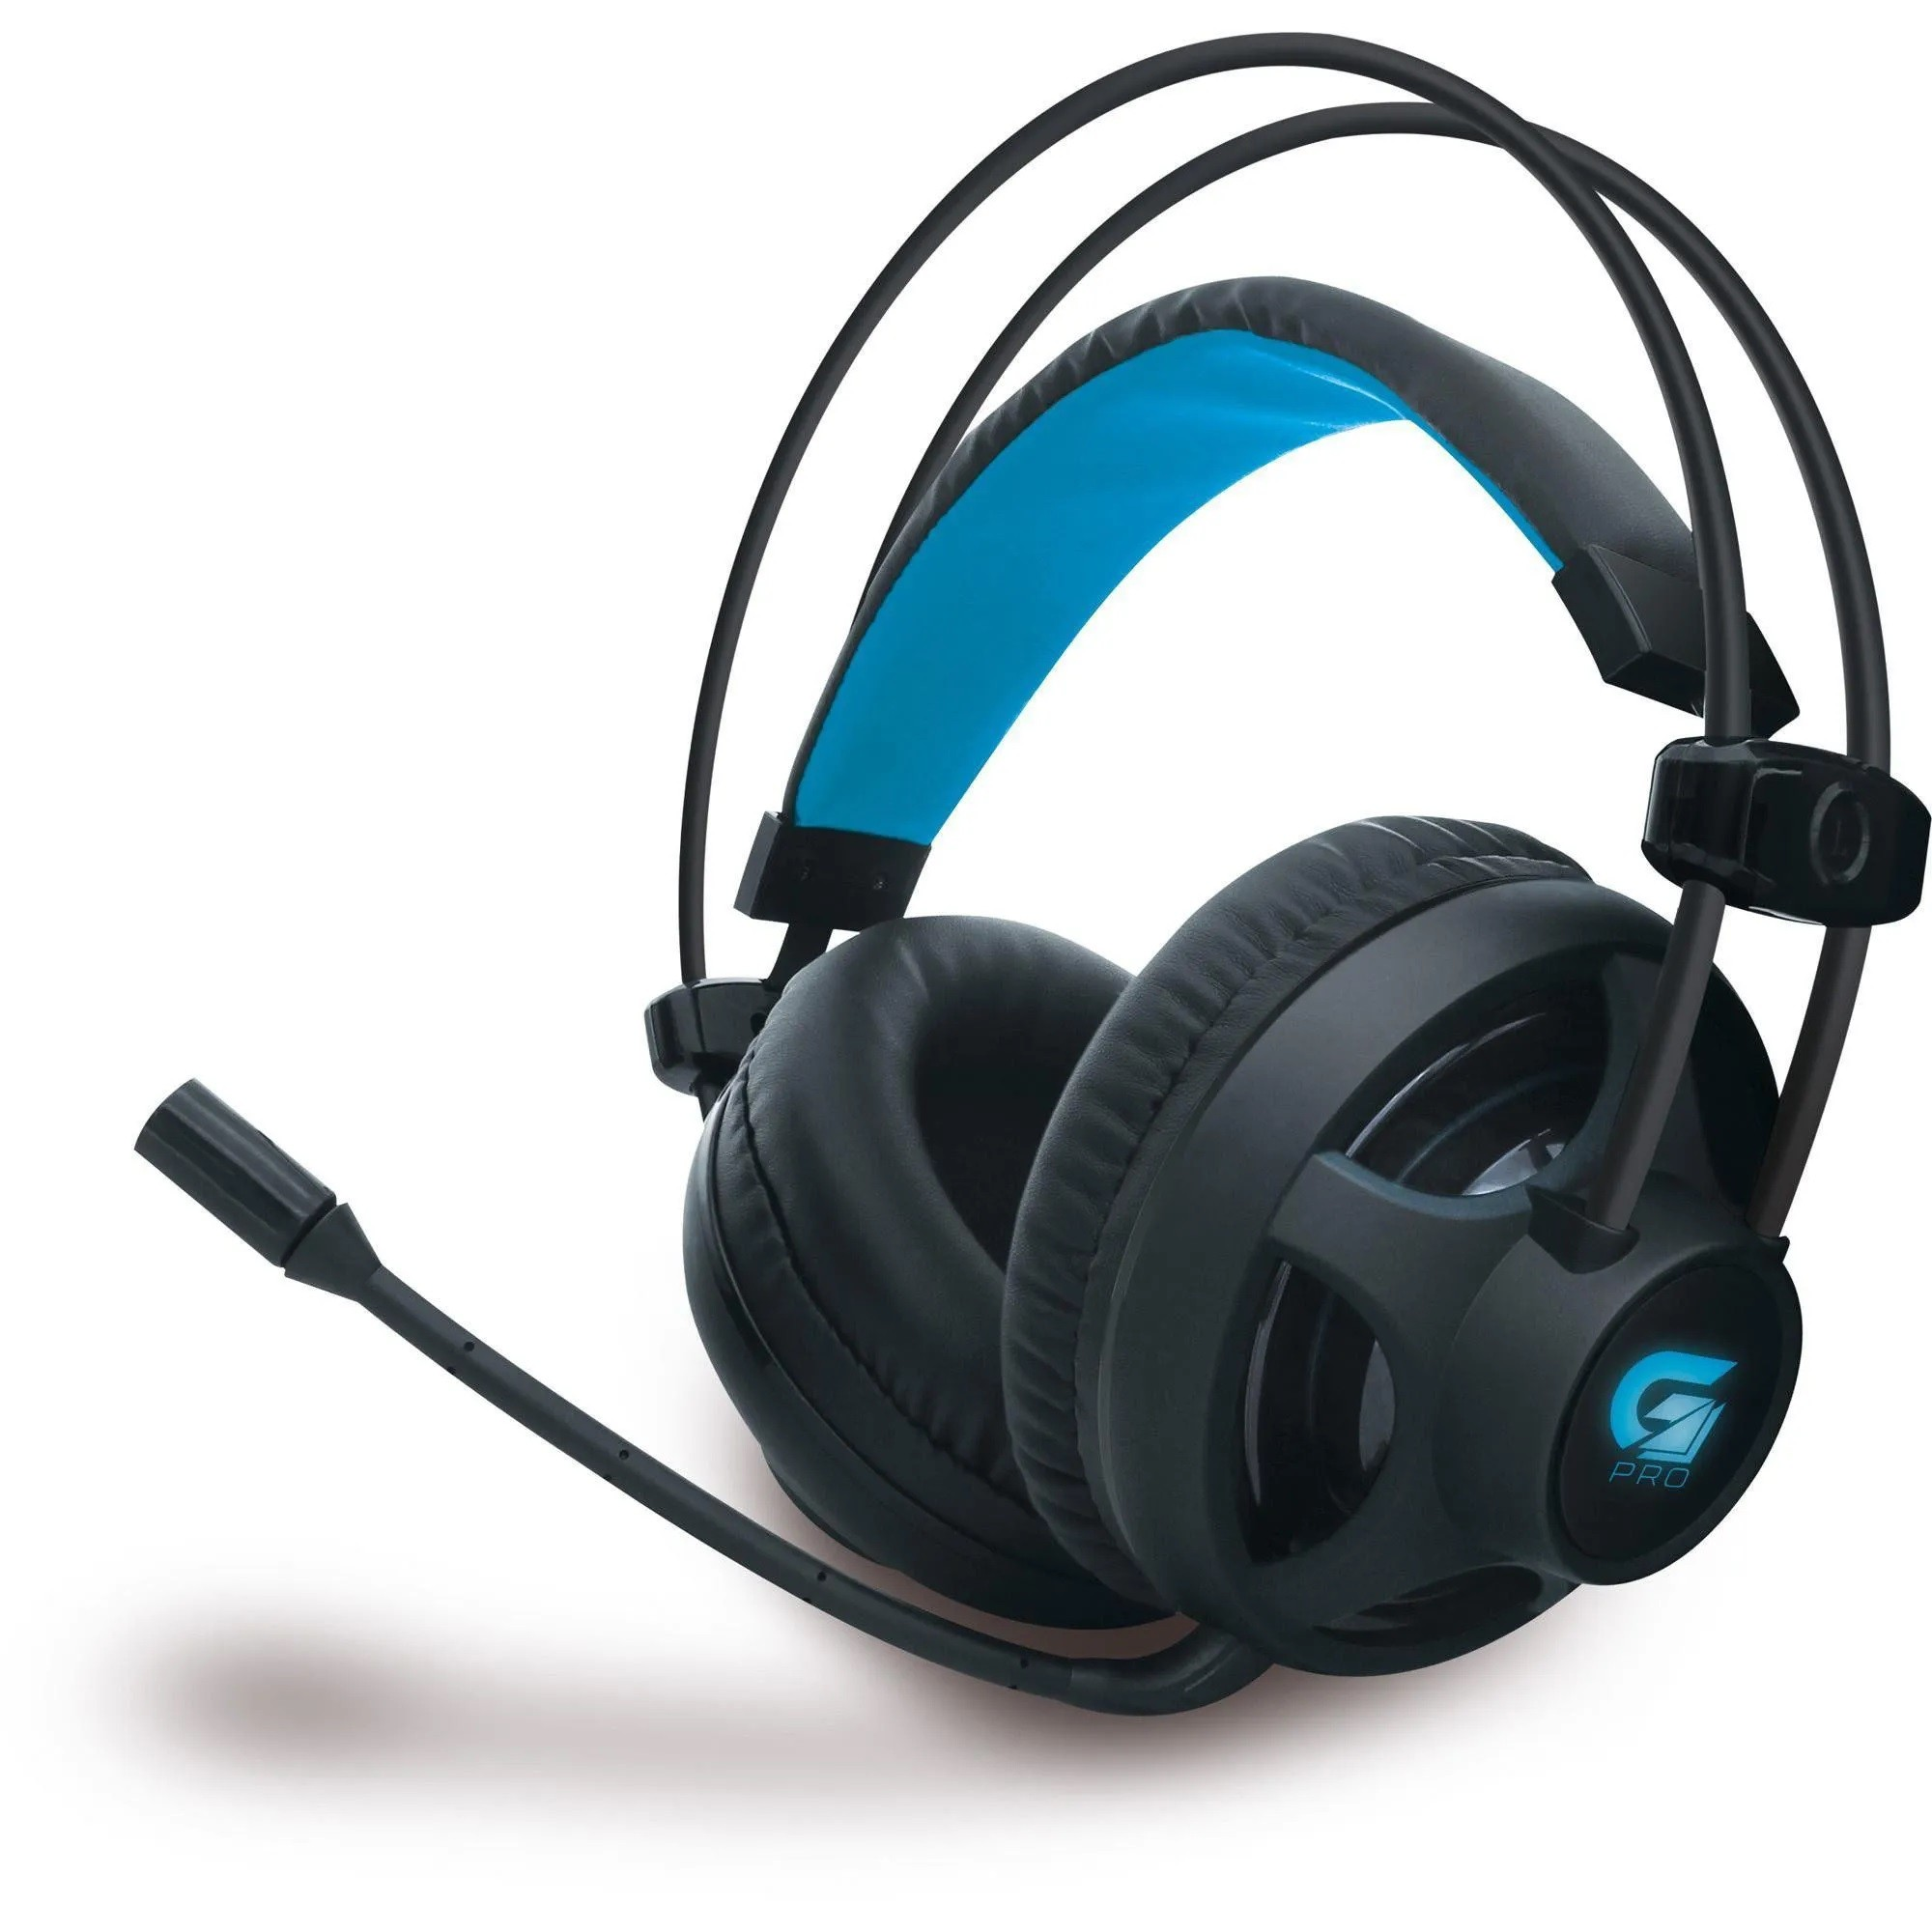 Headset Gamer H2 Fortrek G Pro + Adaptador P3 p/ PS4 e Xone